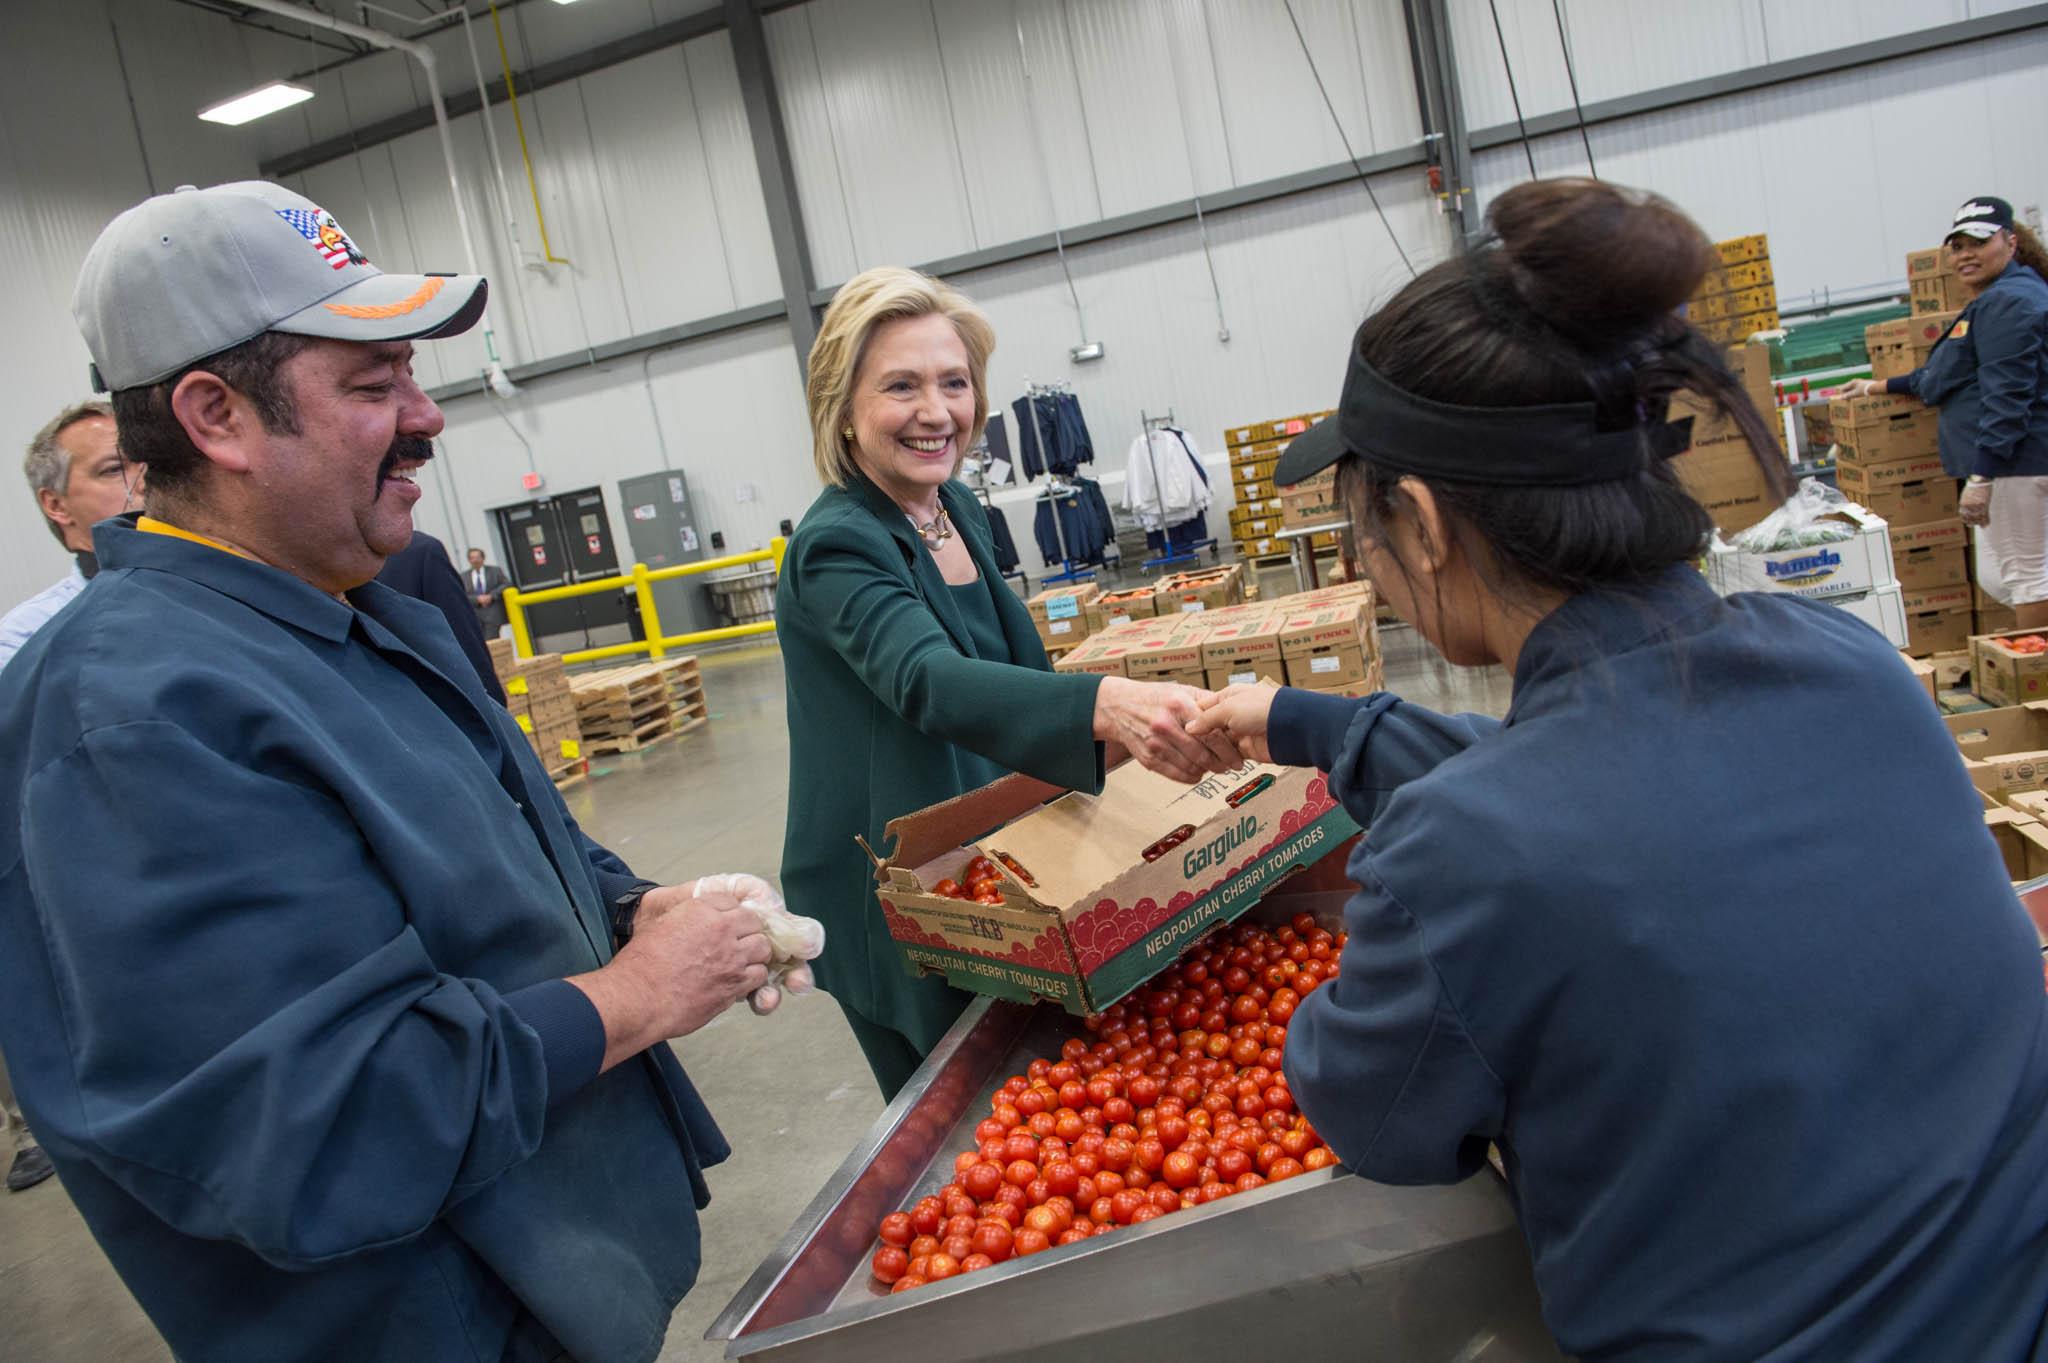 Hillary Clinton visits Capital City Fruit Company in Norwalk, Iowa. April 15, 2015.